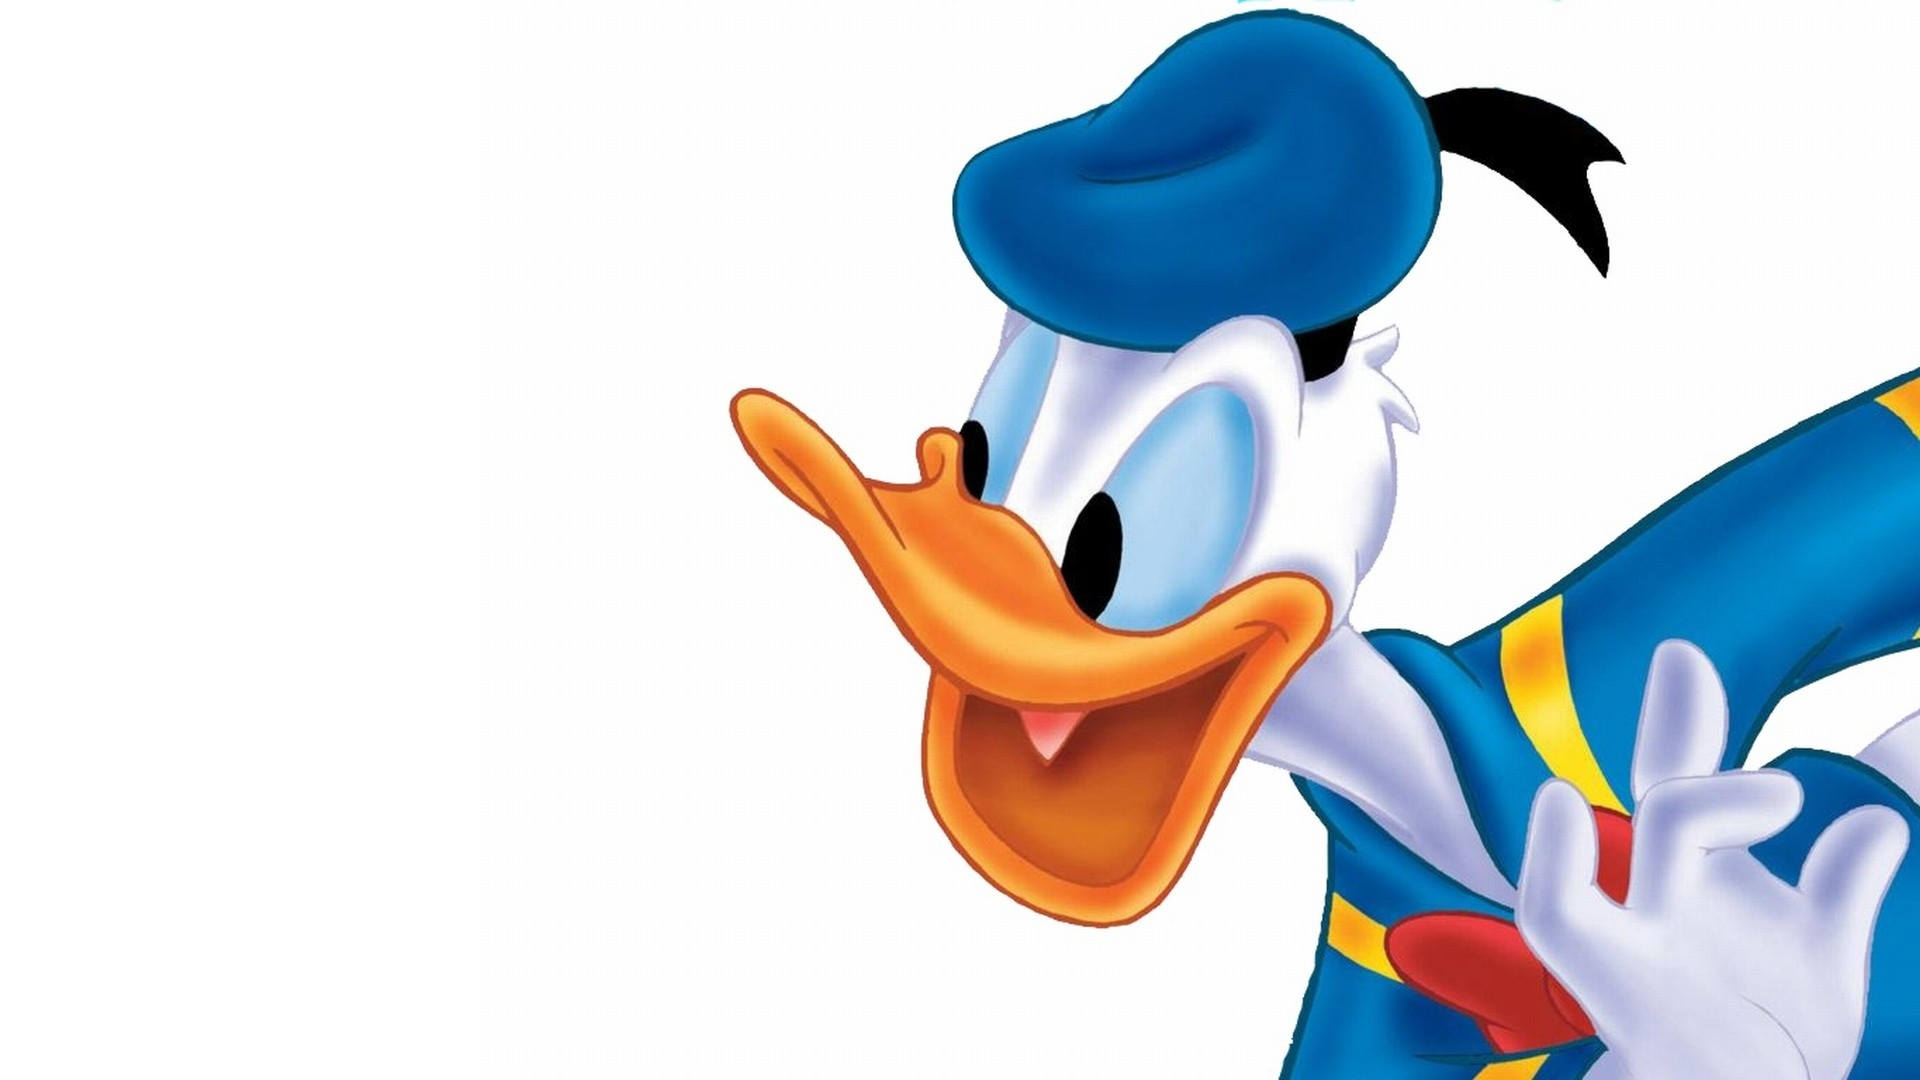 Hd Wallpapers Assassins Creed Fondos De Pantalla Del Pato Donald Wallpapers Hd Para